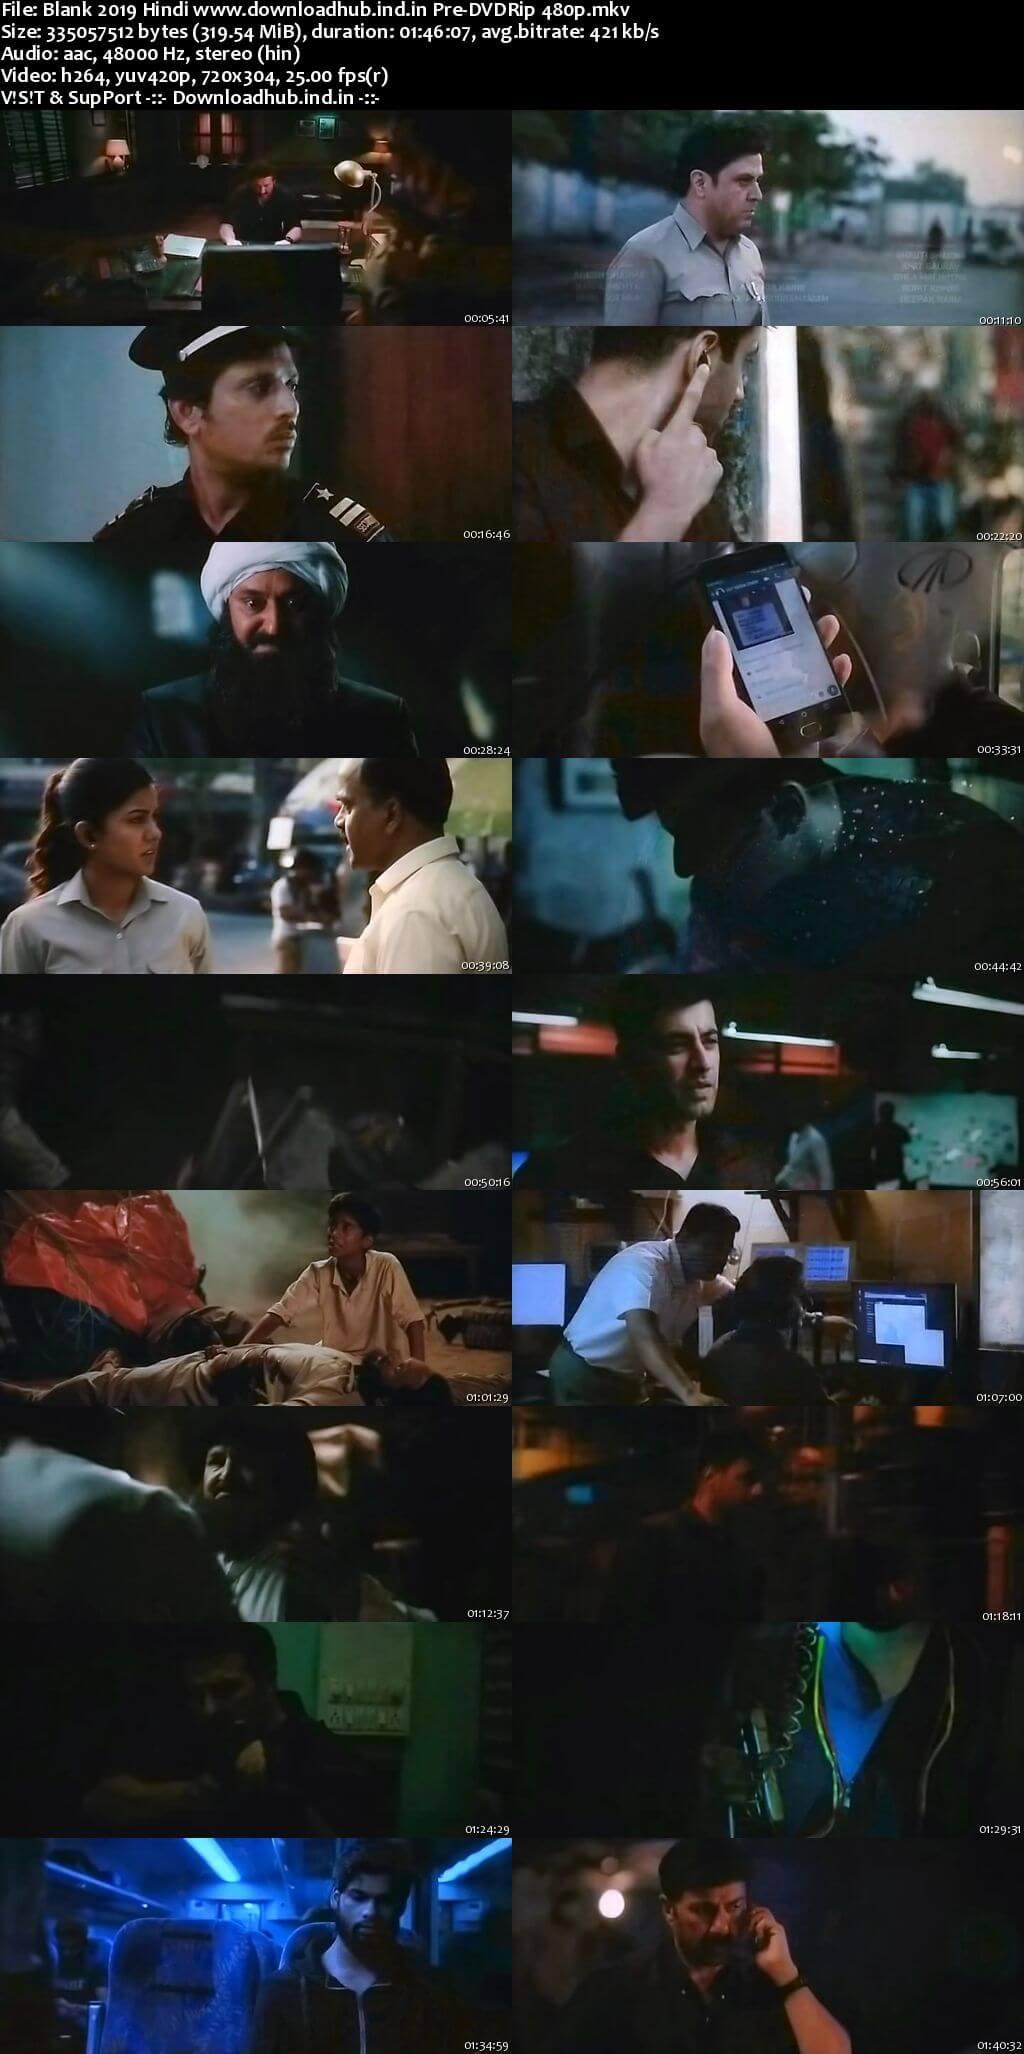 Blank 2019 Hindi 300MB Pre-DVDRip 480p